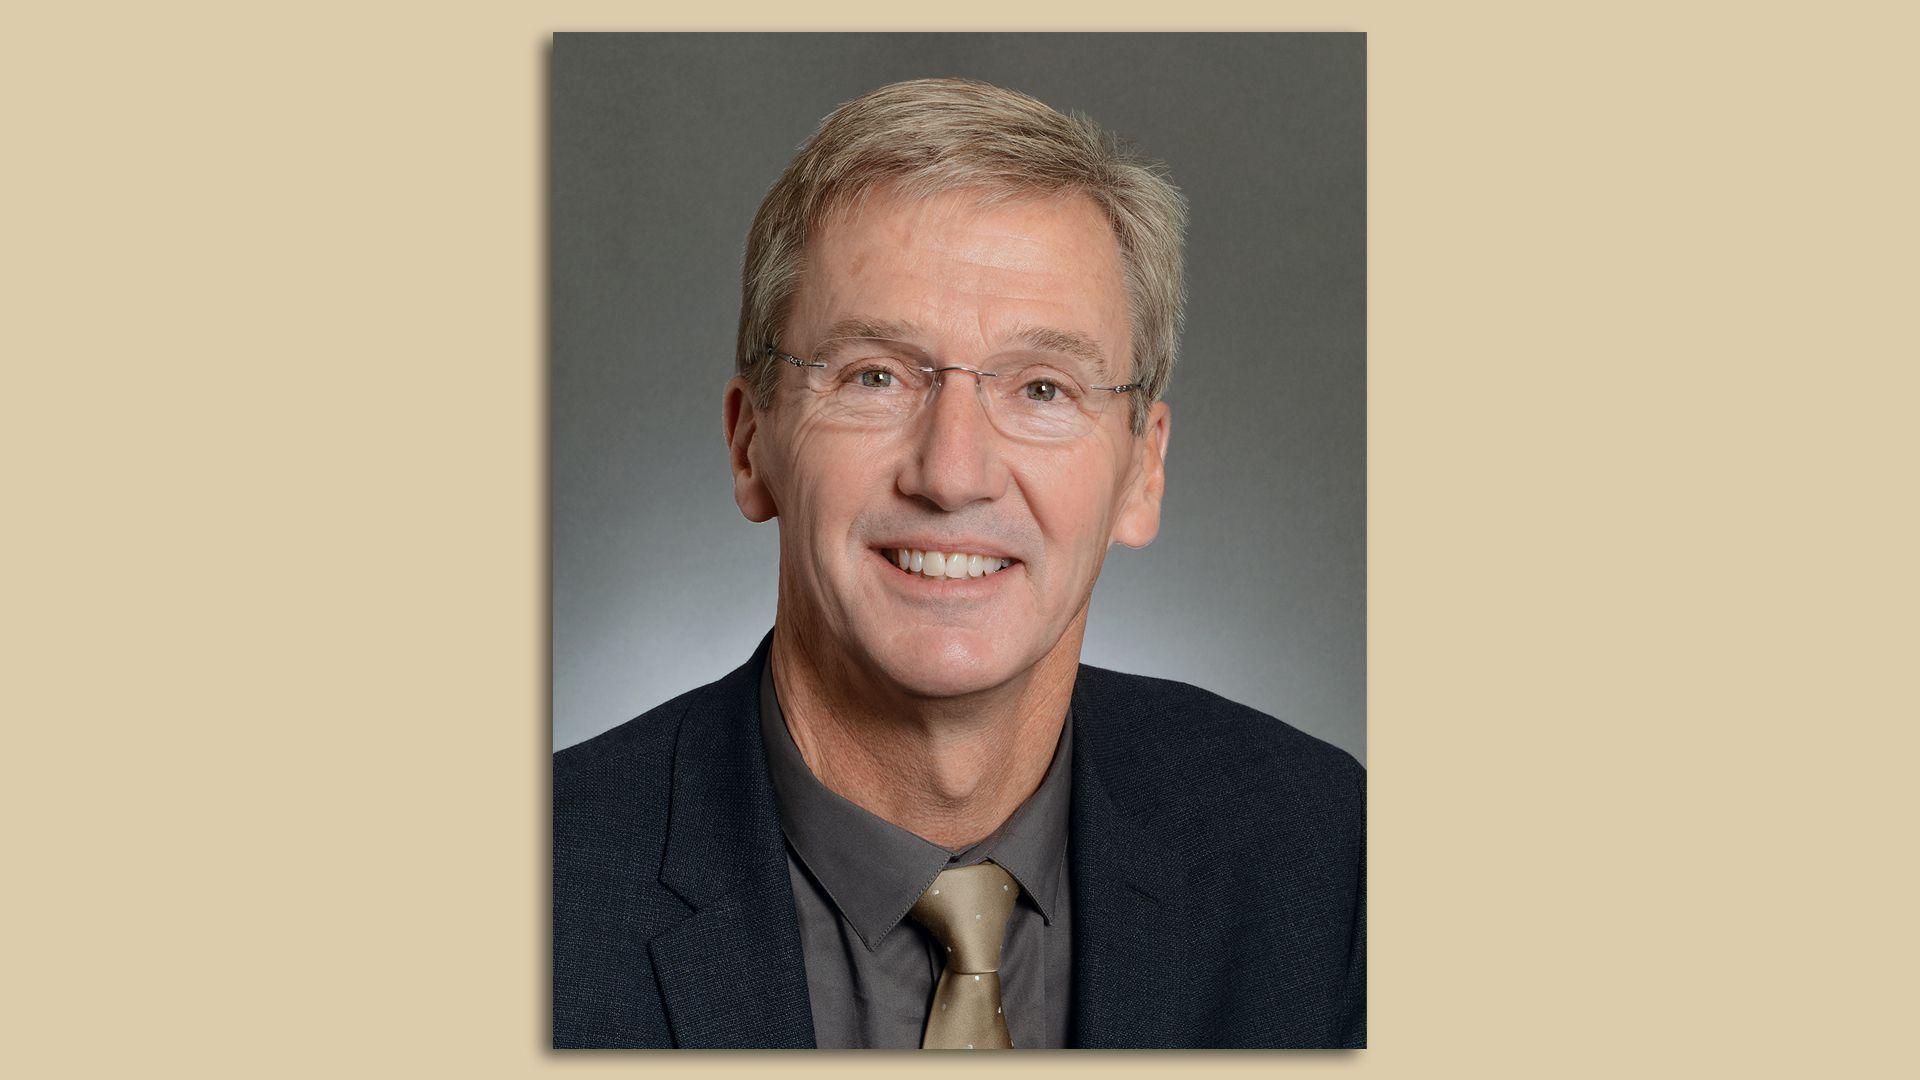 Former state Sen. Scott Jensen